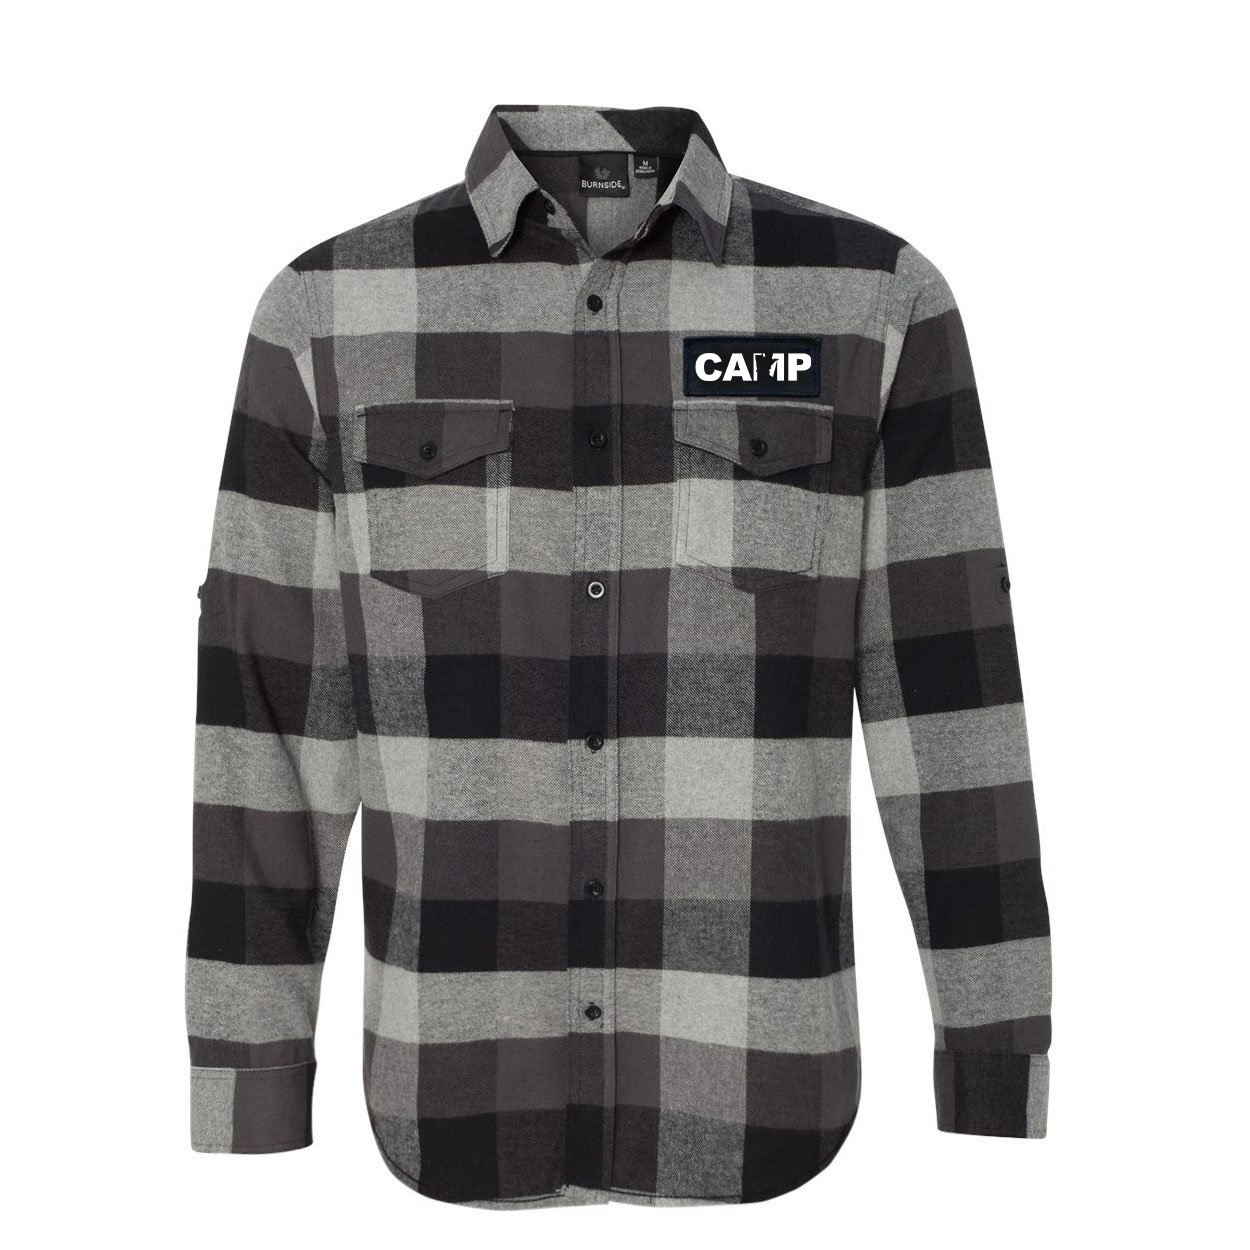 Camp Minnesota Classic Unisex Long Sleeve Woven Patch Flannel Shirt Black/Gray (White Logo)